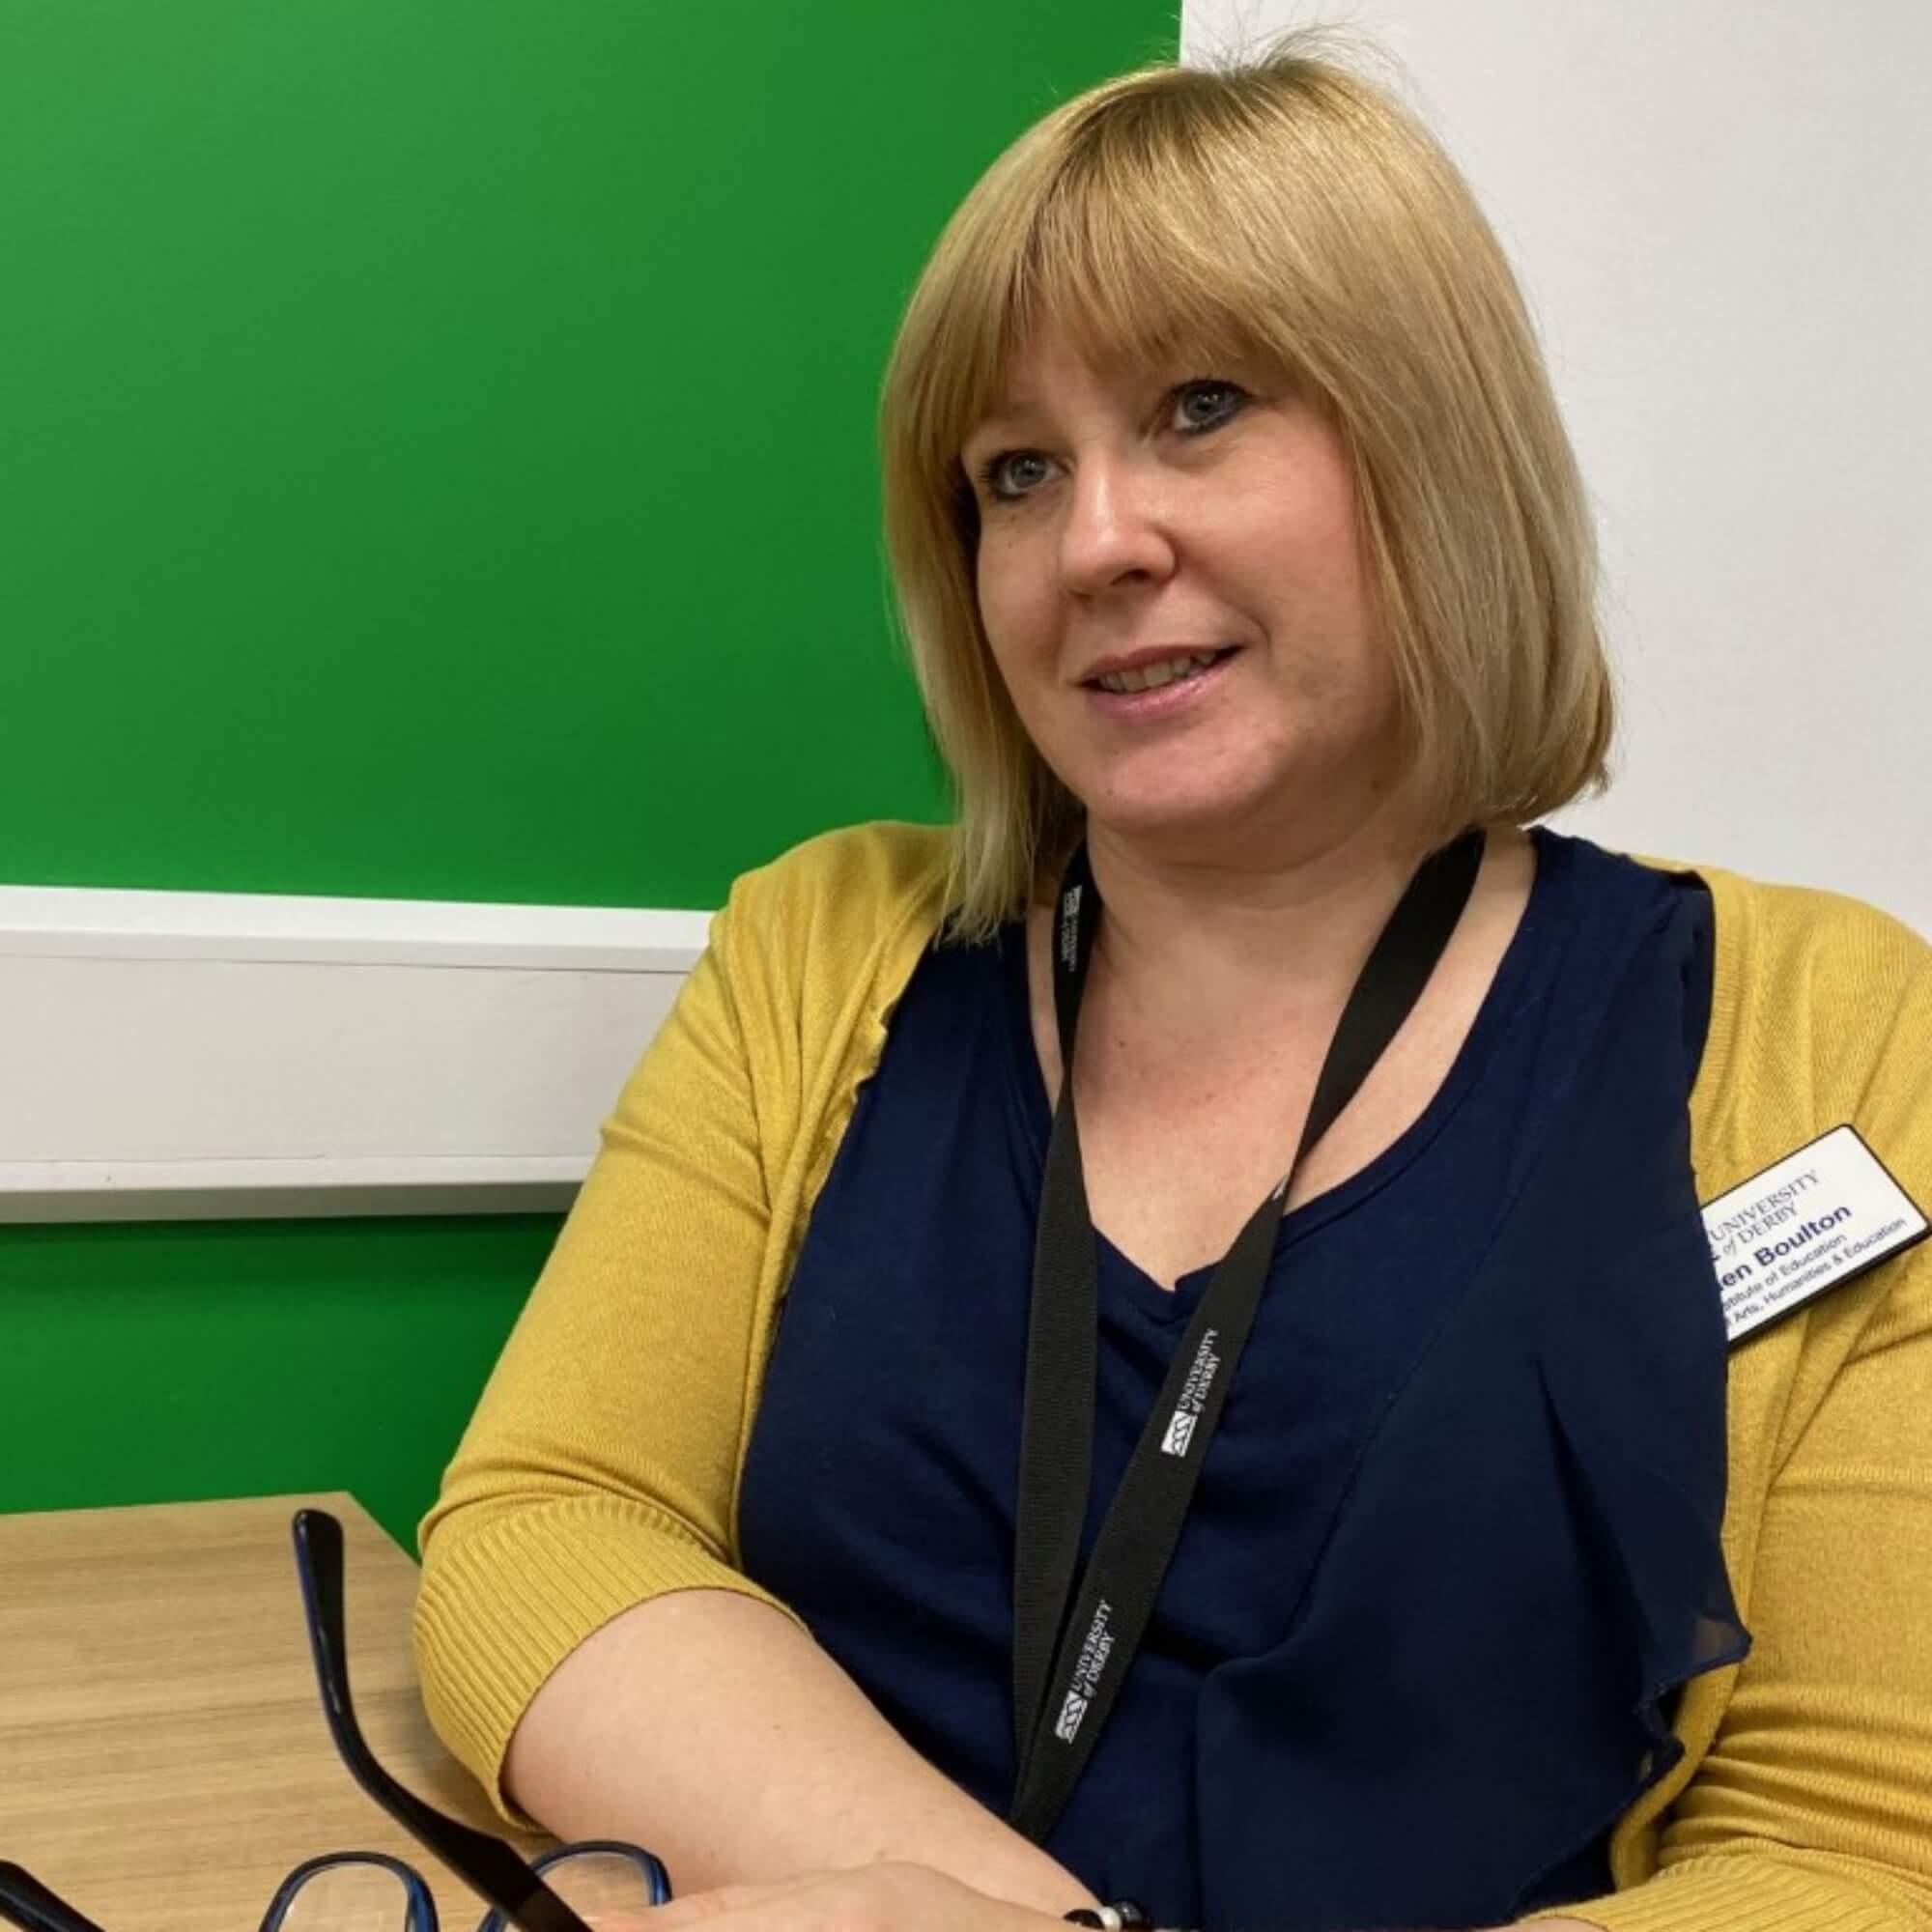 Helen Boulton staff profile picture